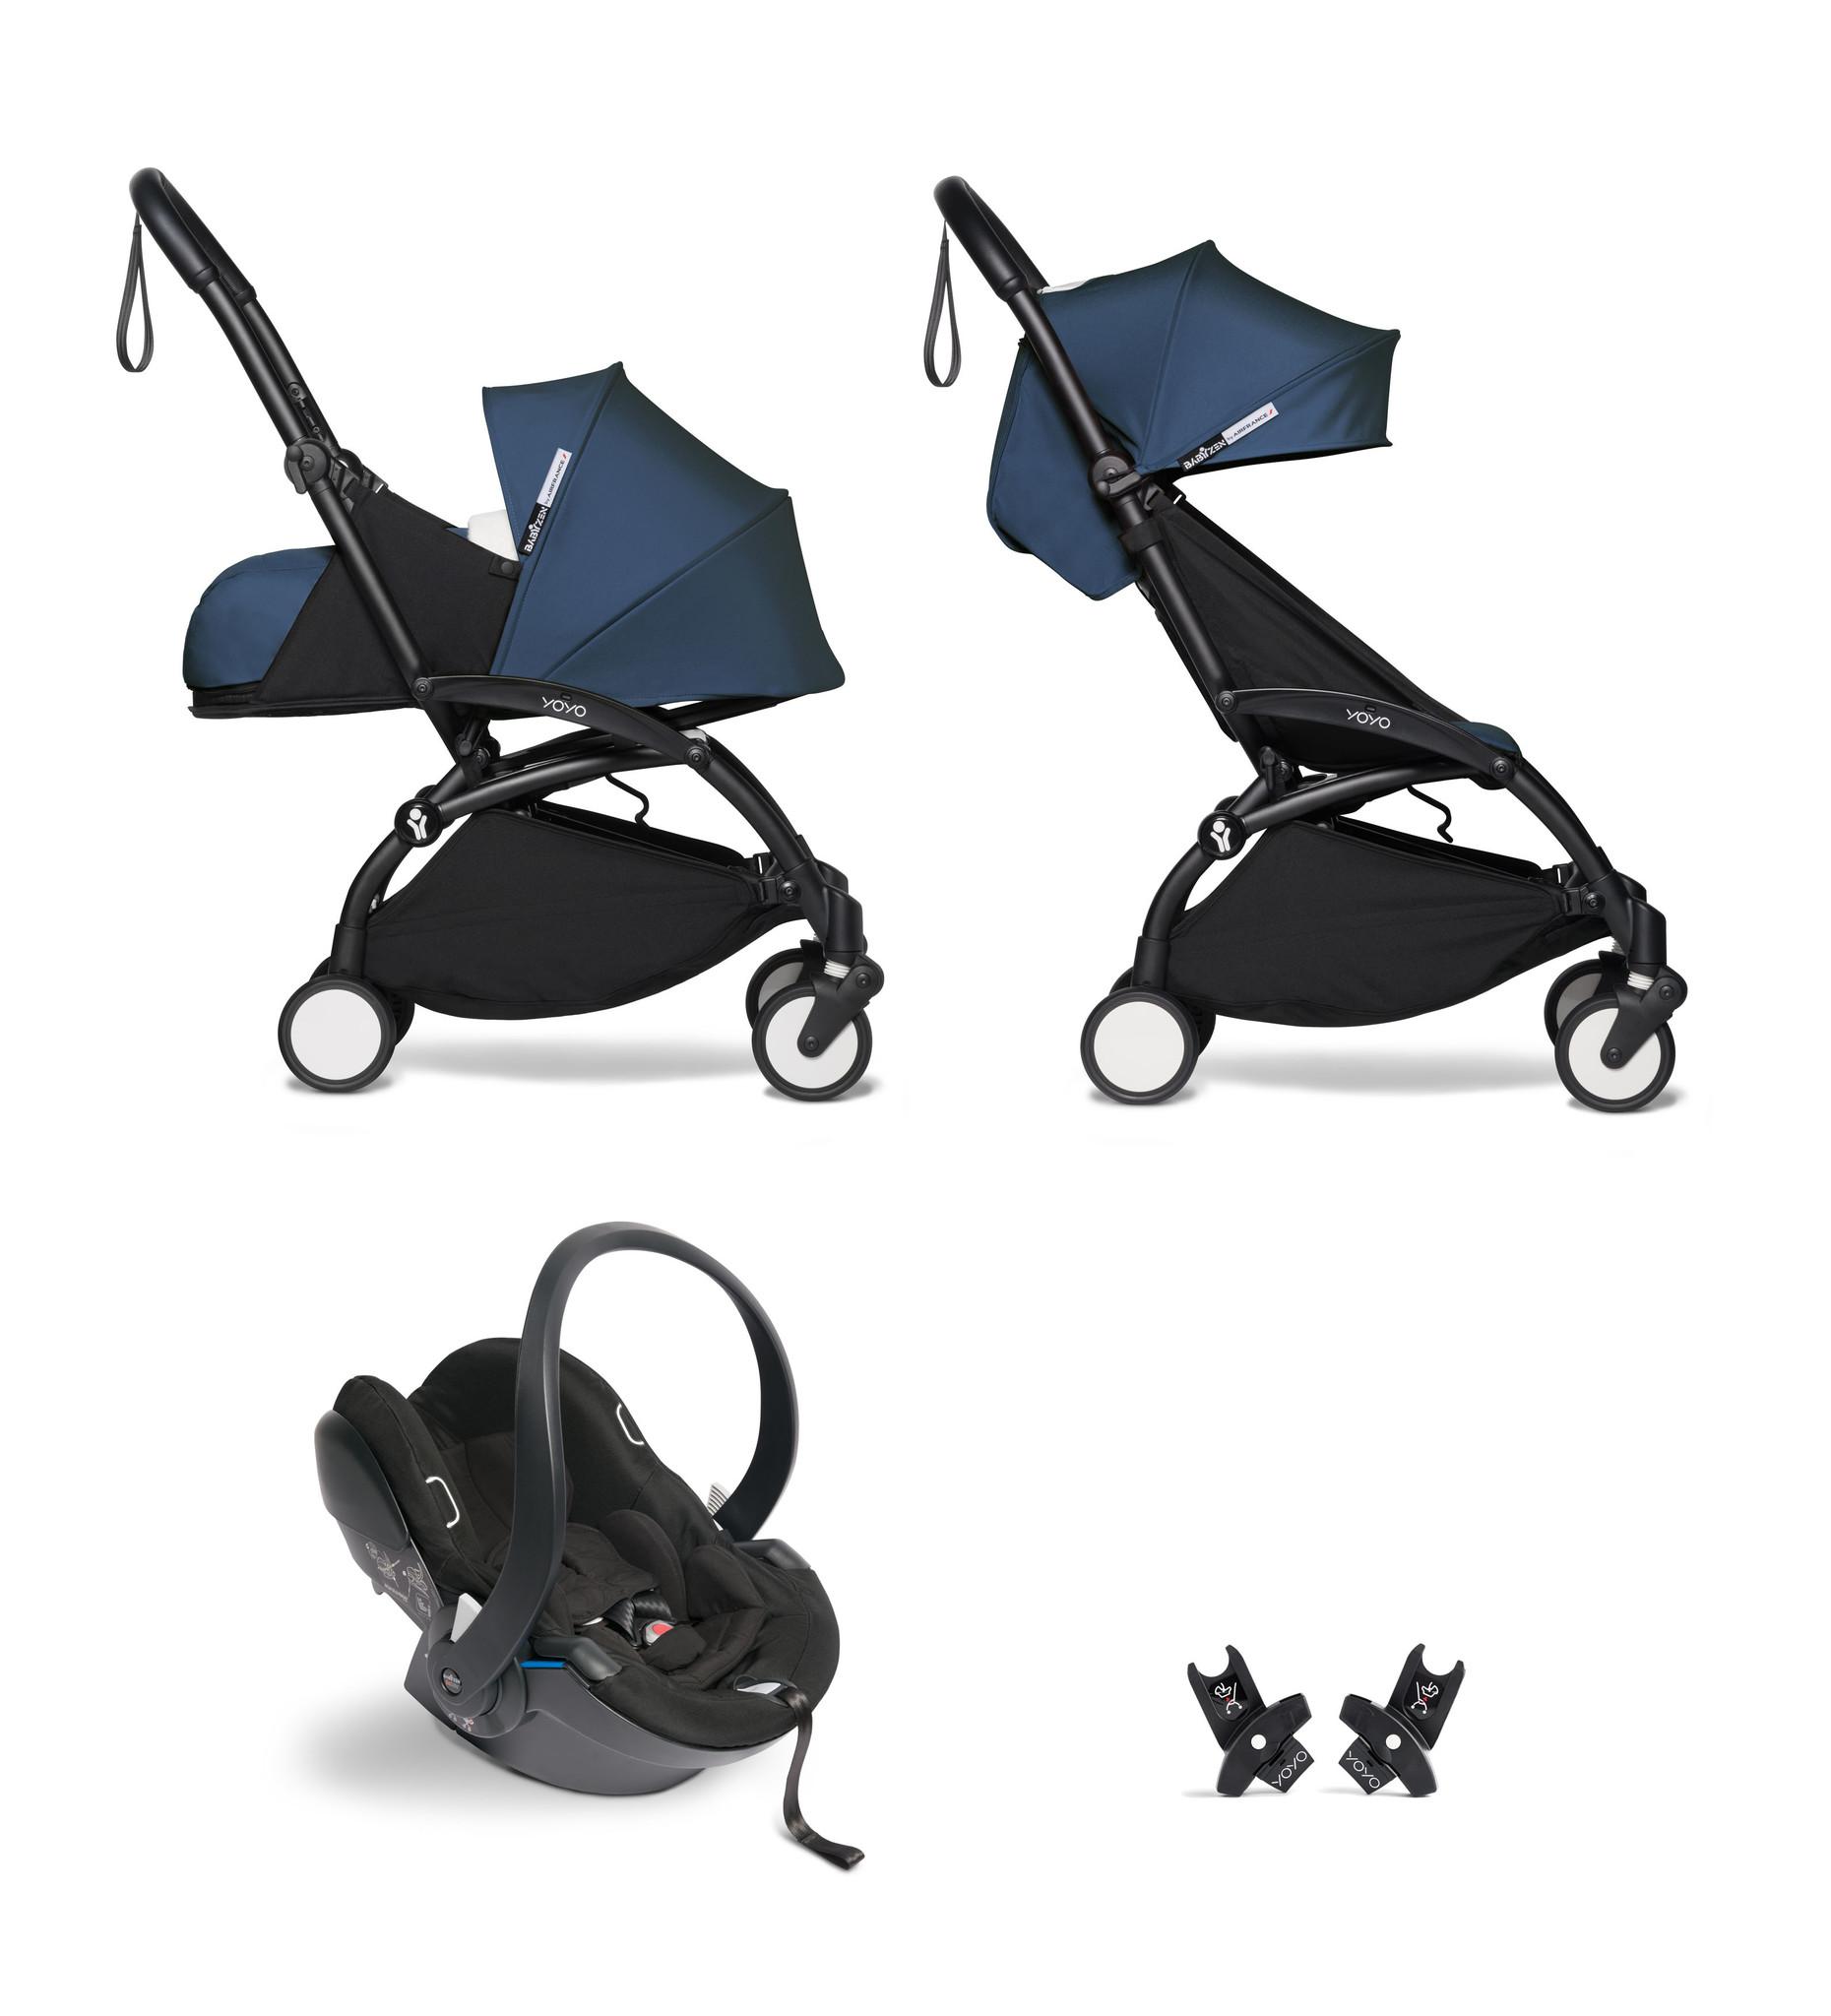 Babyzen YOYO² buggy COMPLEET / FULL SET 0+ and 6+ navy AirFrance frame zwart incl. YOYO² BeSafe auto